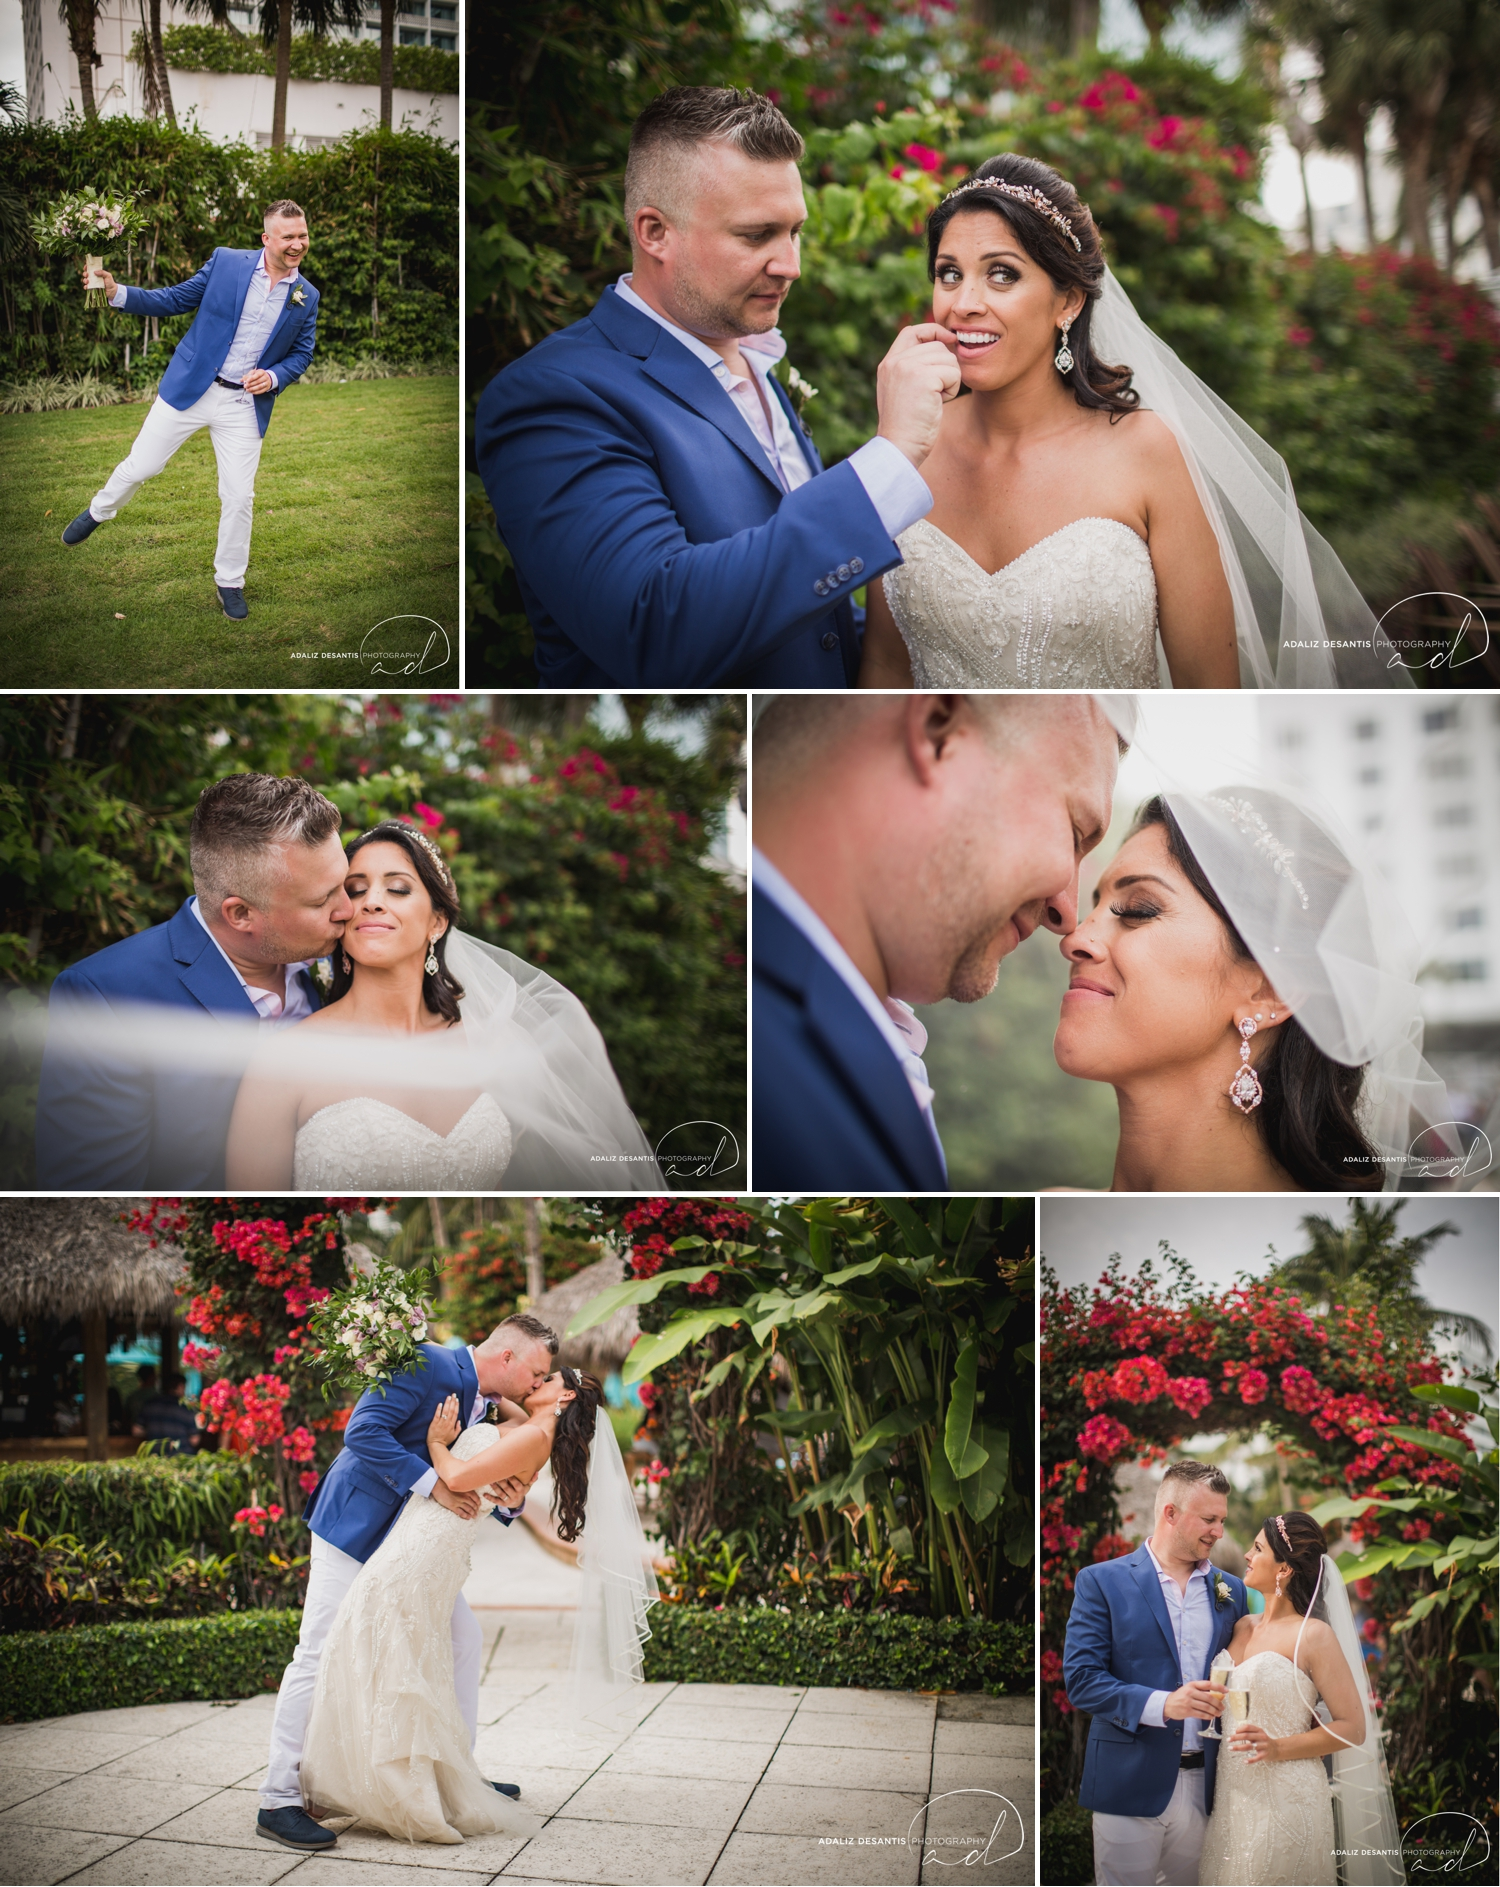 Carmen Alex palms hotel spa miami beach destination wedding lavender roses cuban cigar England cuba bride rose gold elegant Maggie Sottero Badgley Mischka 14.jpg